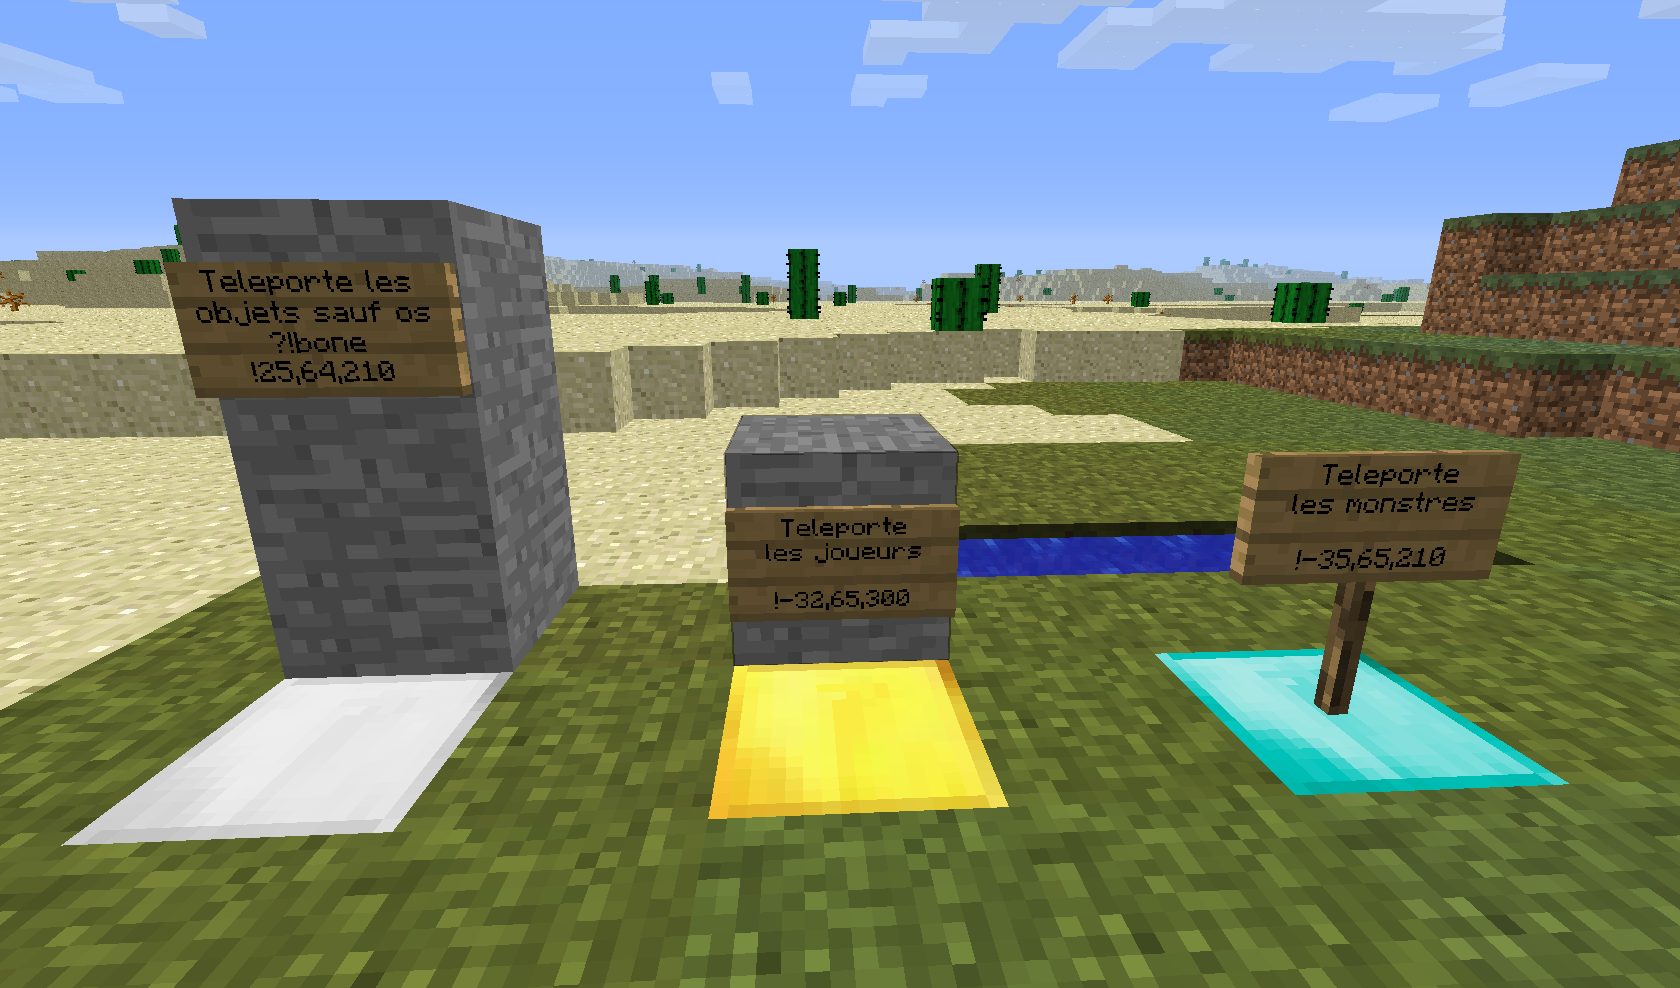 Comment avoir une epee cheater dans minecraft - Comment faire une table dans minecraft ...